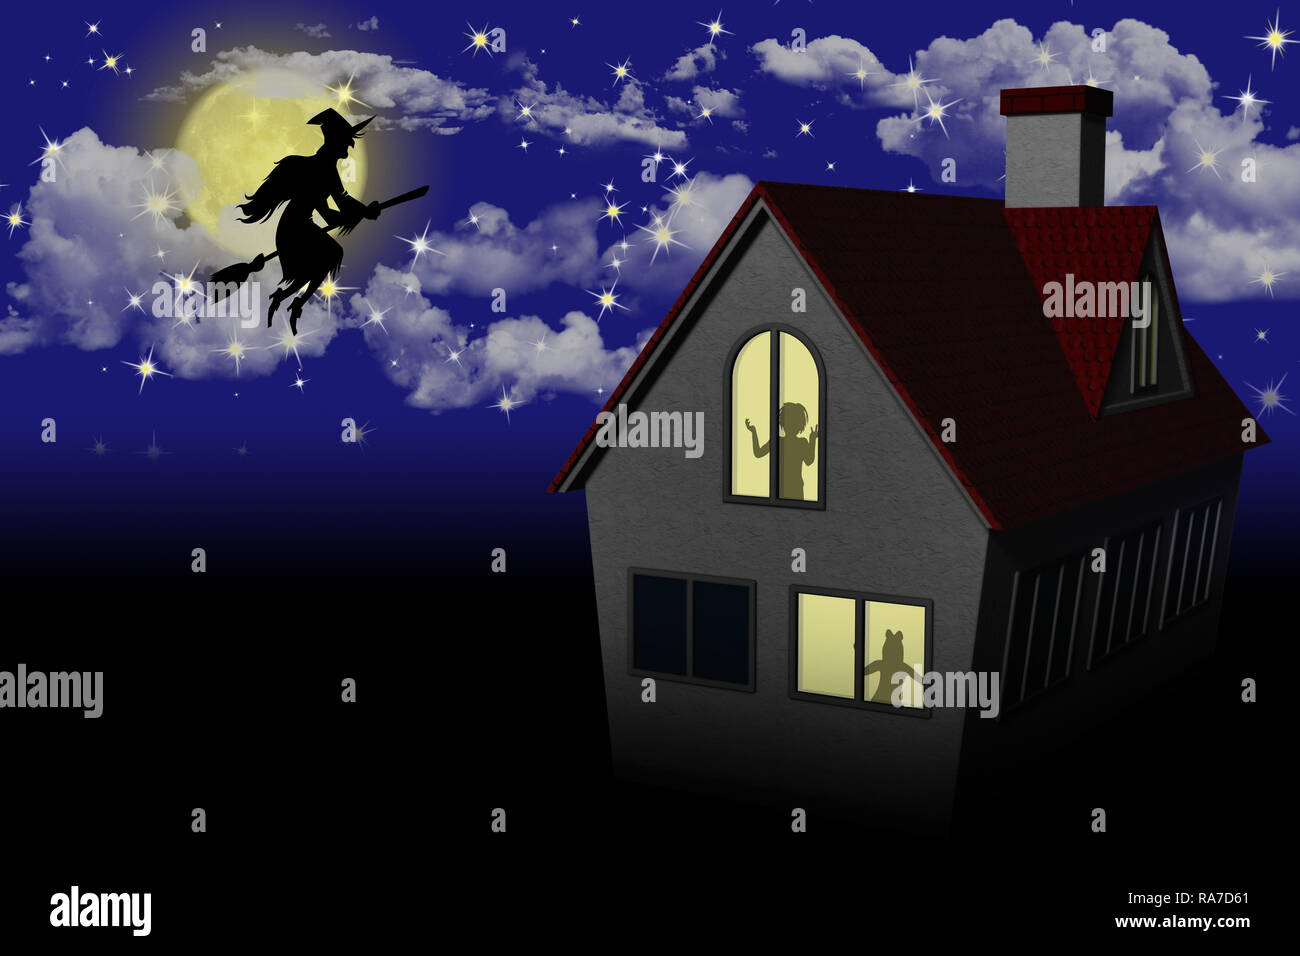 Epifania, Befana con scopa nella notte. Stock Photo